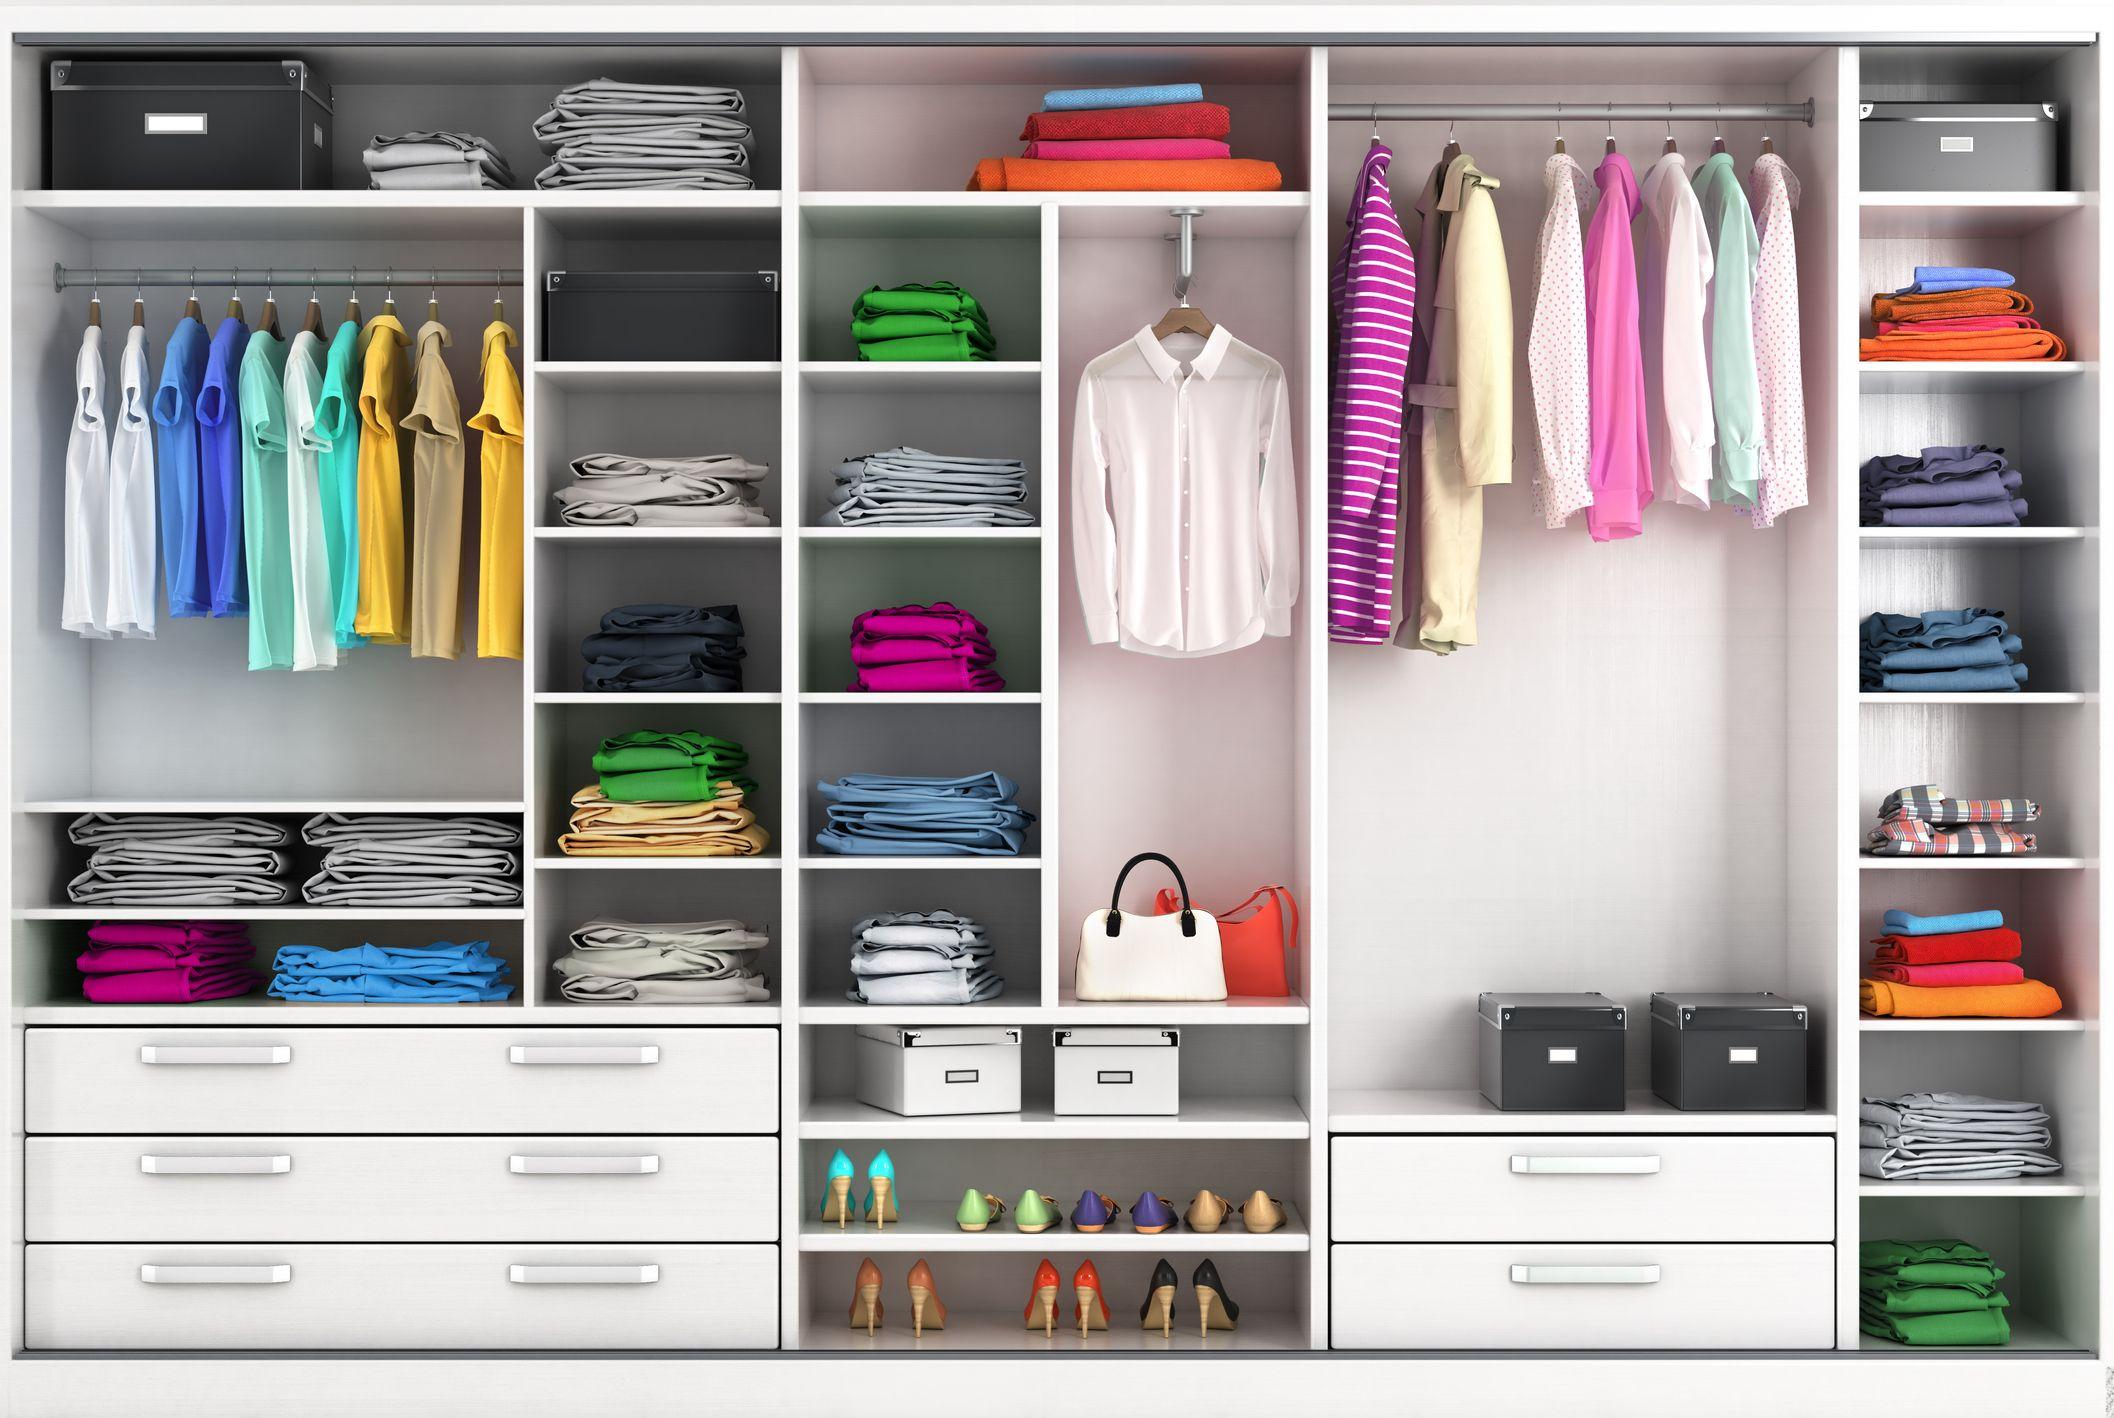 15 DIY Closet Organization Ideas That Will Make Getting Dressed so Much Easier